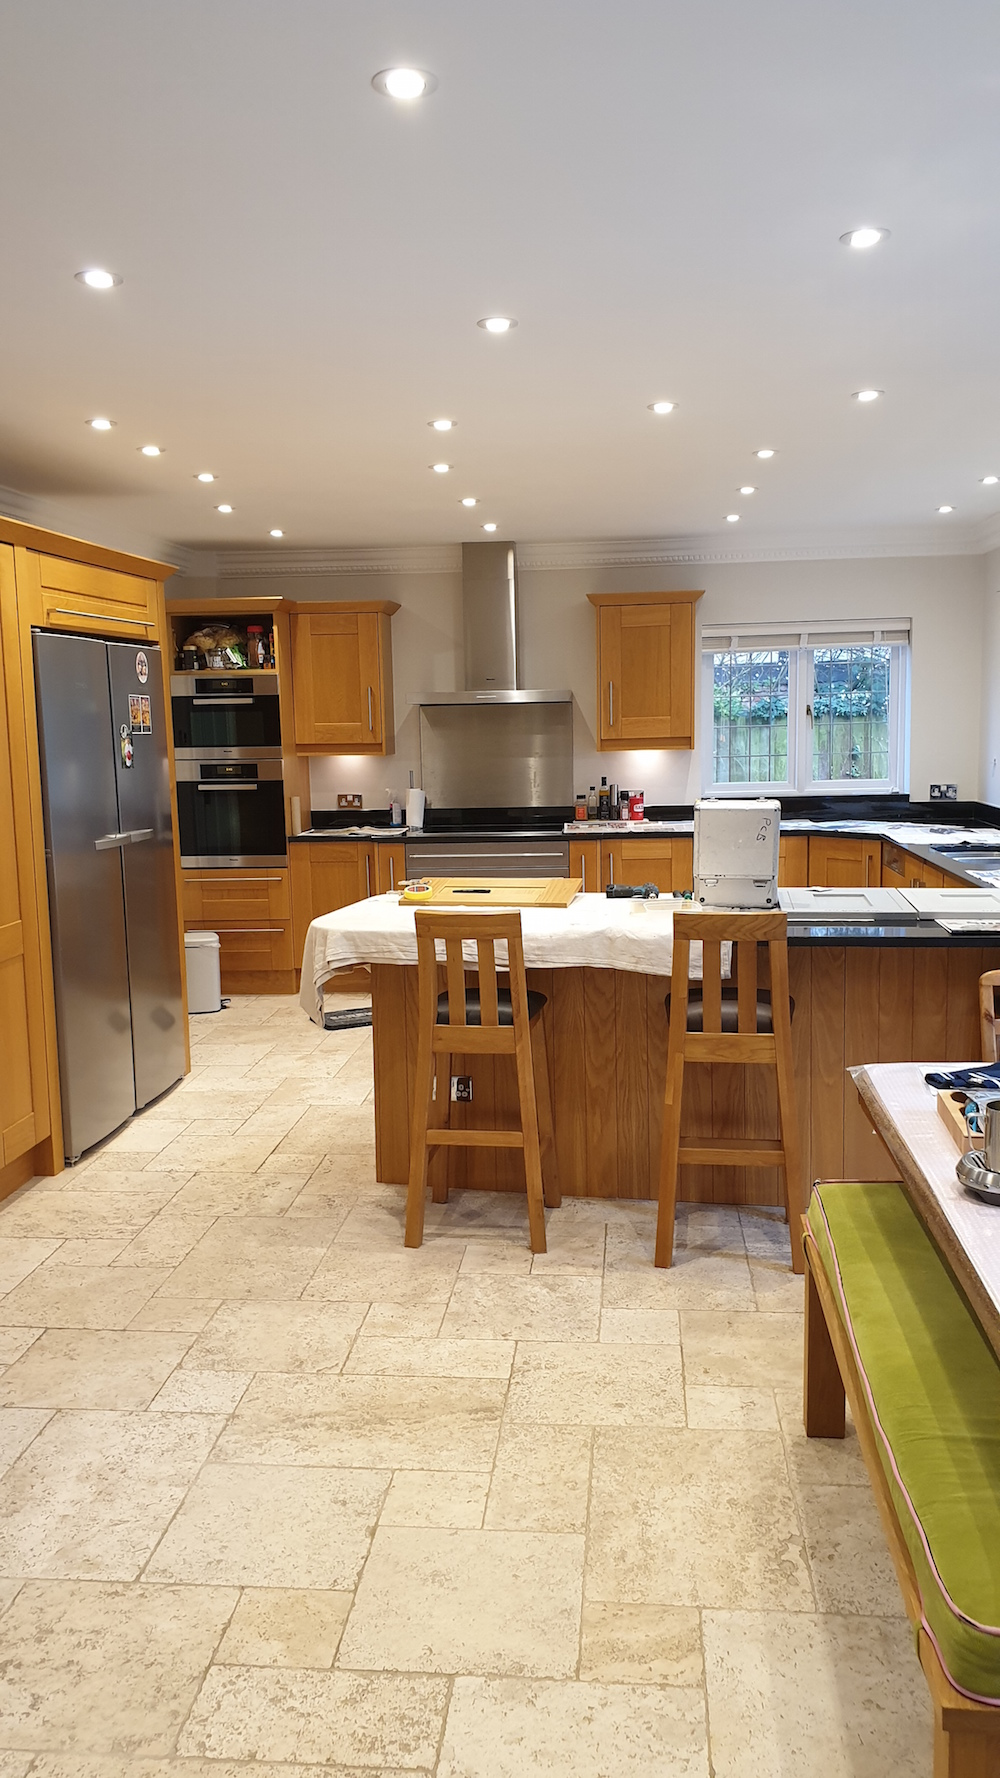 beautiful kitchen made of oak 10 years old in Radlett